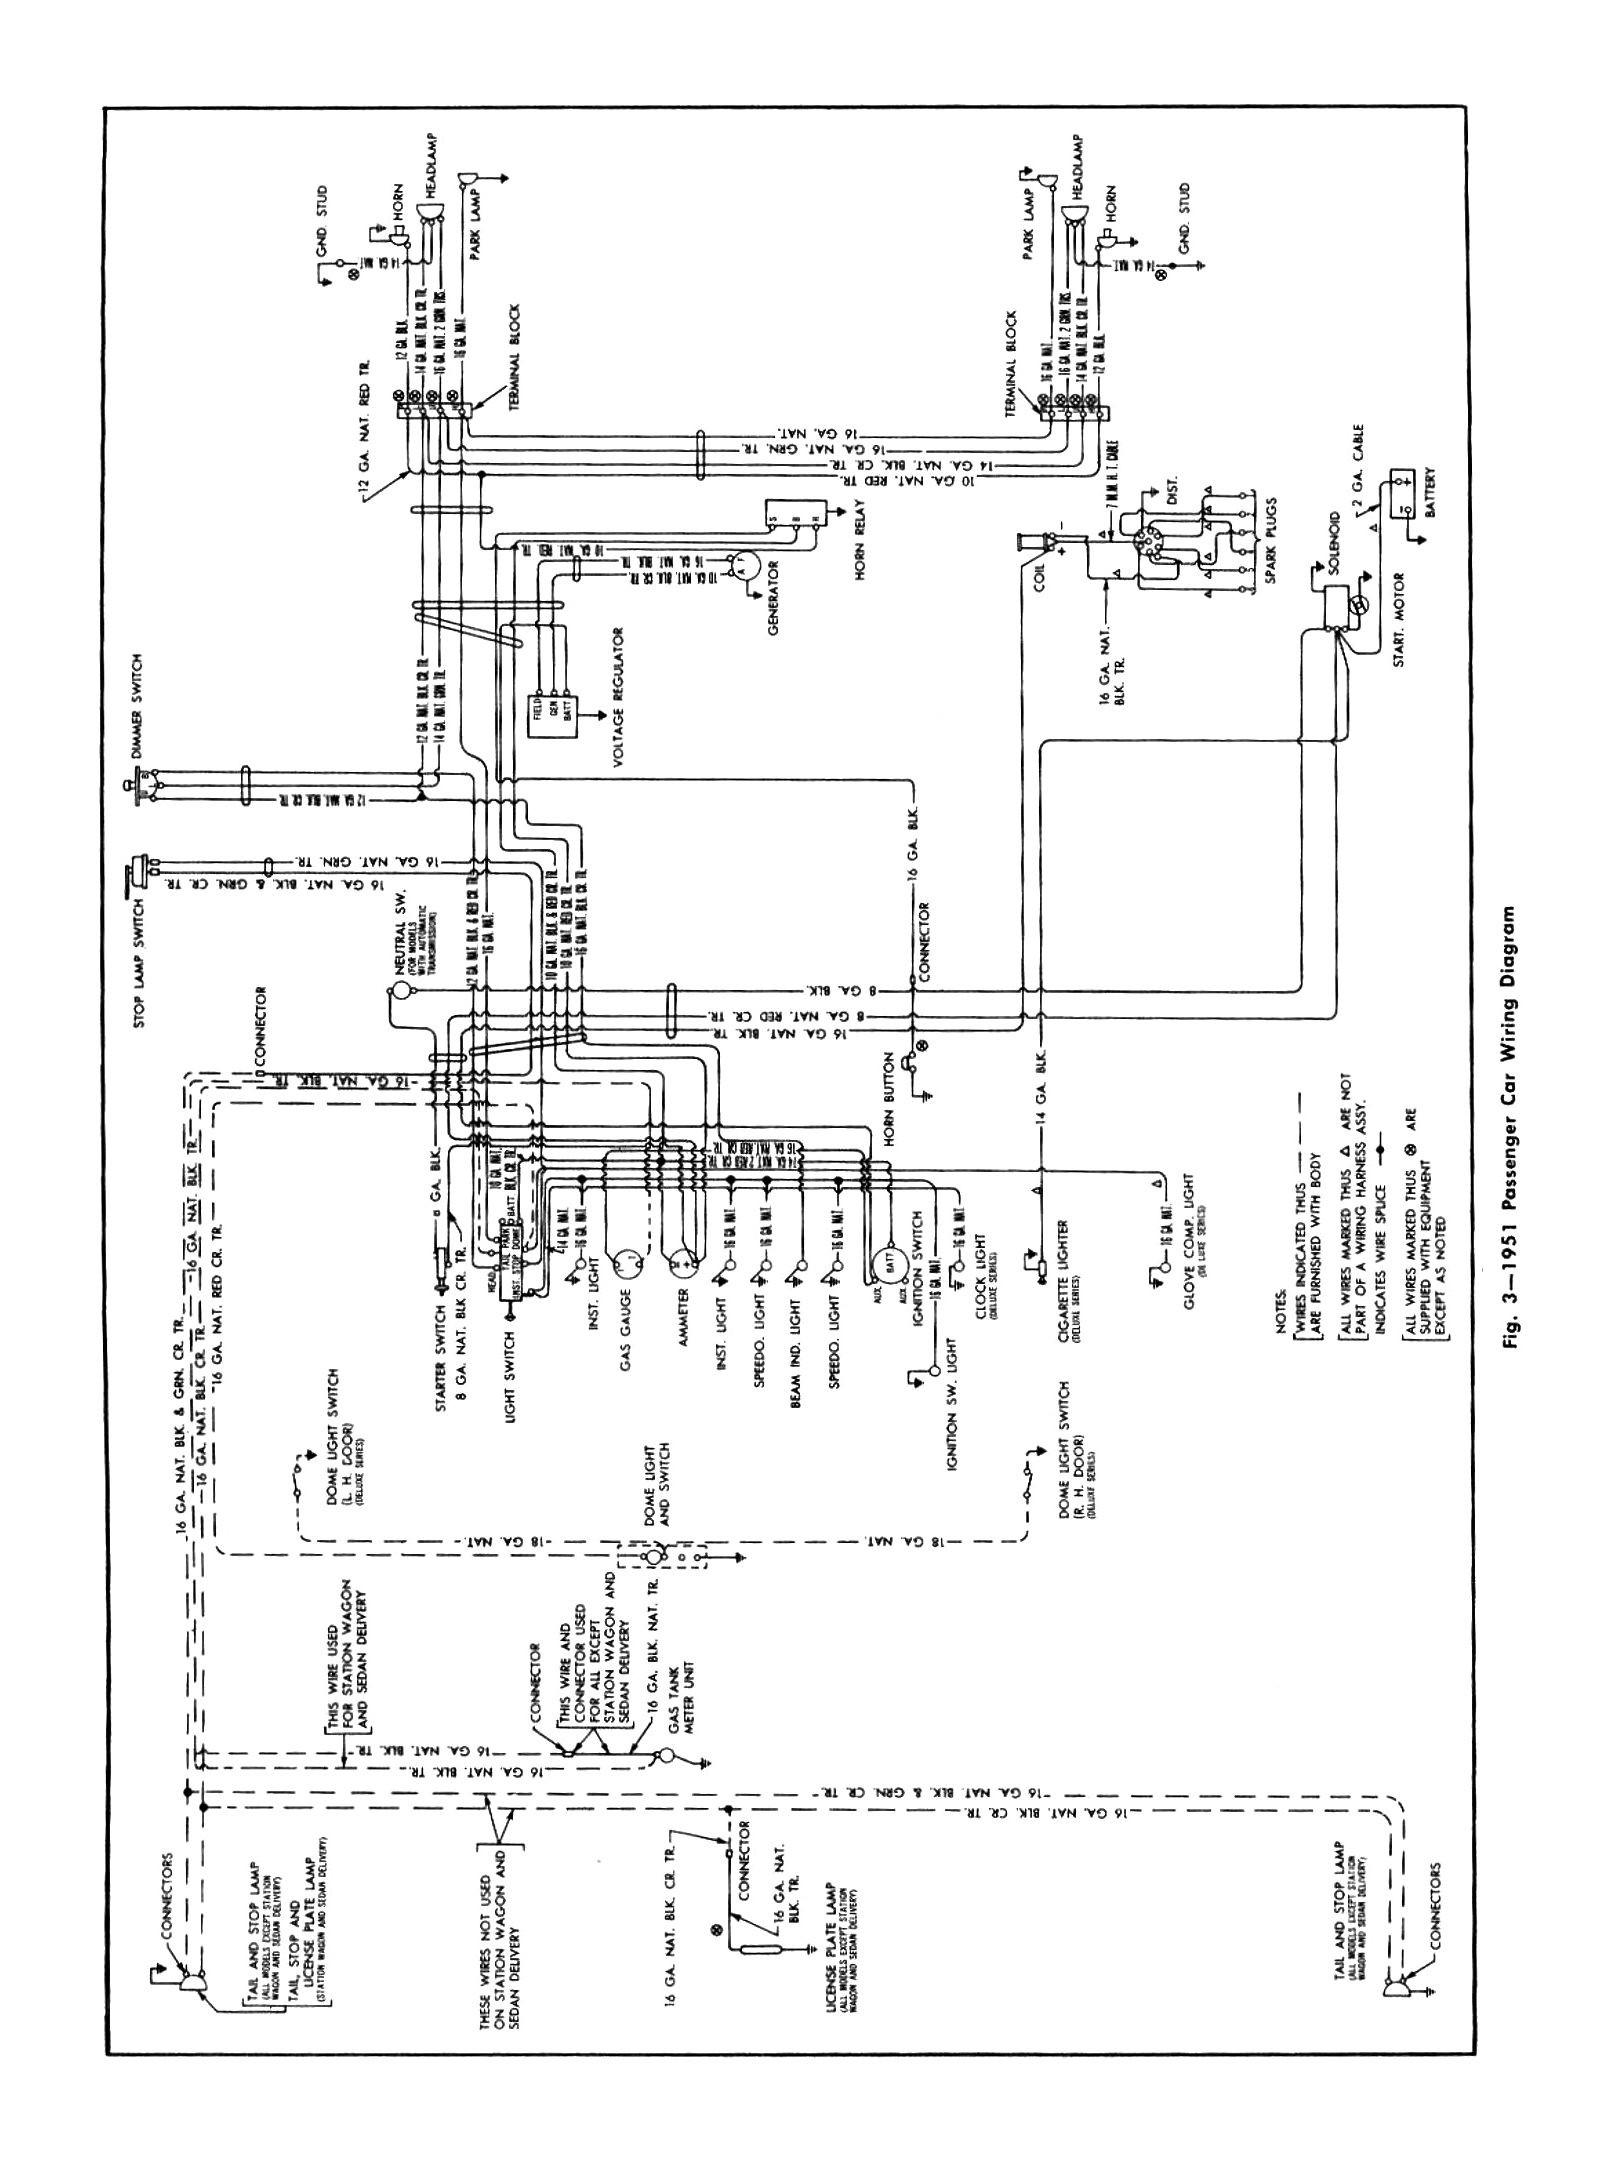 Wiring Diagrahm for 1988 Club Car Golf Cart Chevy Wiring Diagrams Of Wiring Diagrahm for 1988 Club Car Golf Cart